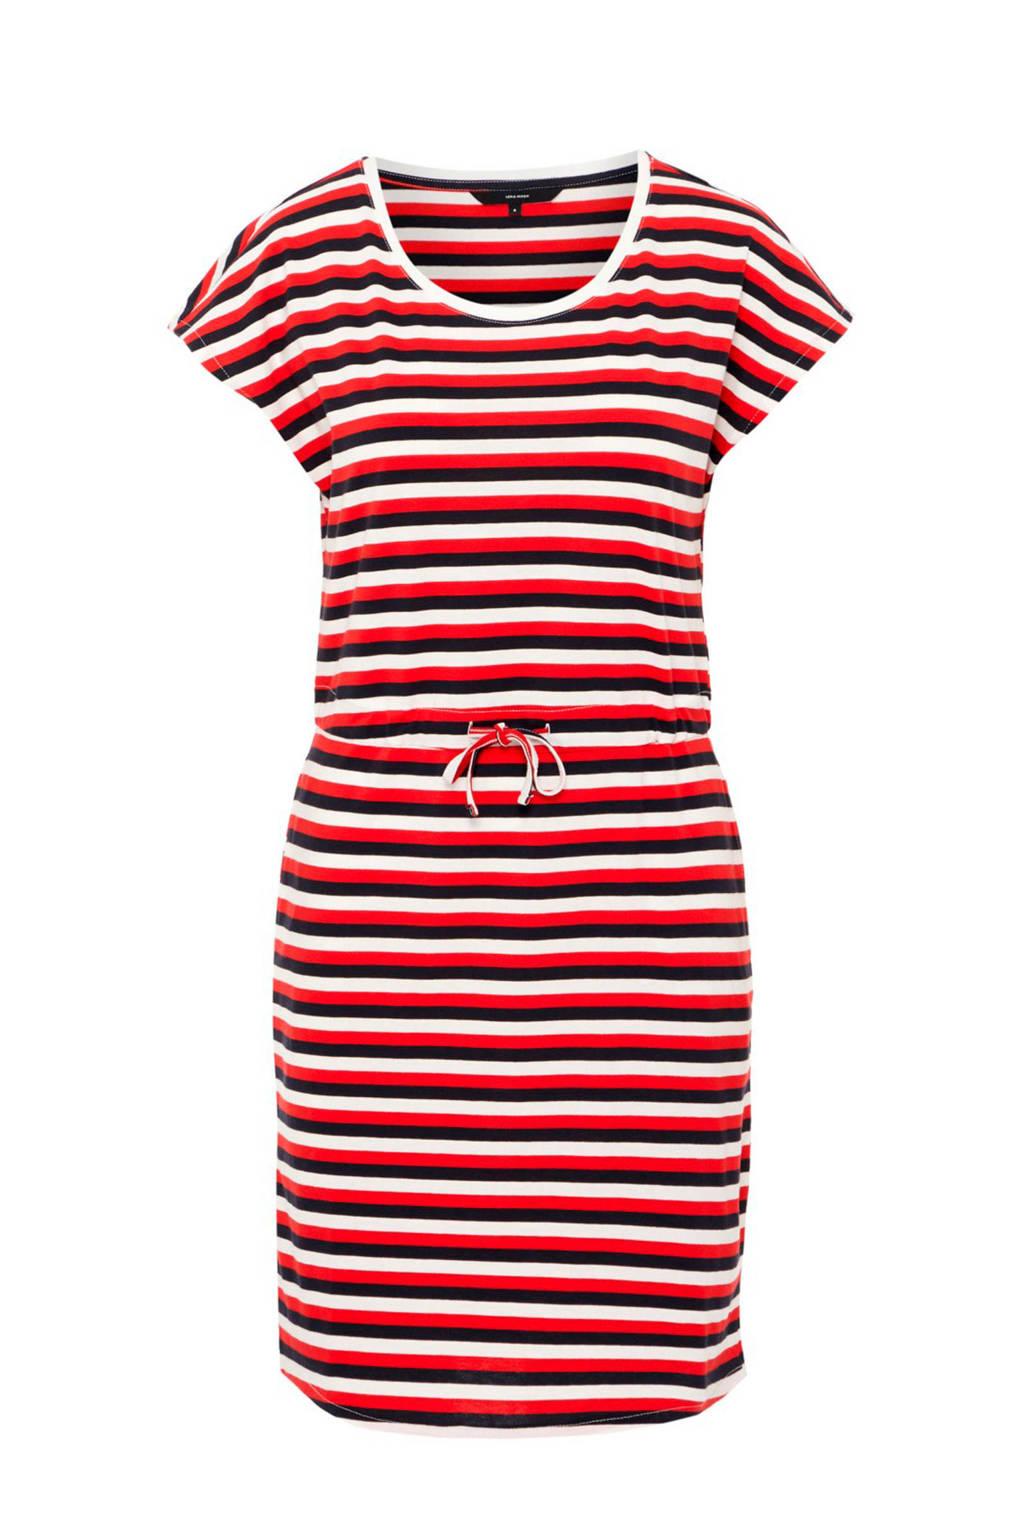 AWARE by VERO MODA gestreepte jurk met steekzakken, Wit/rood/blauw